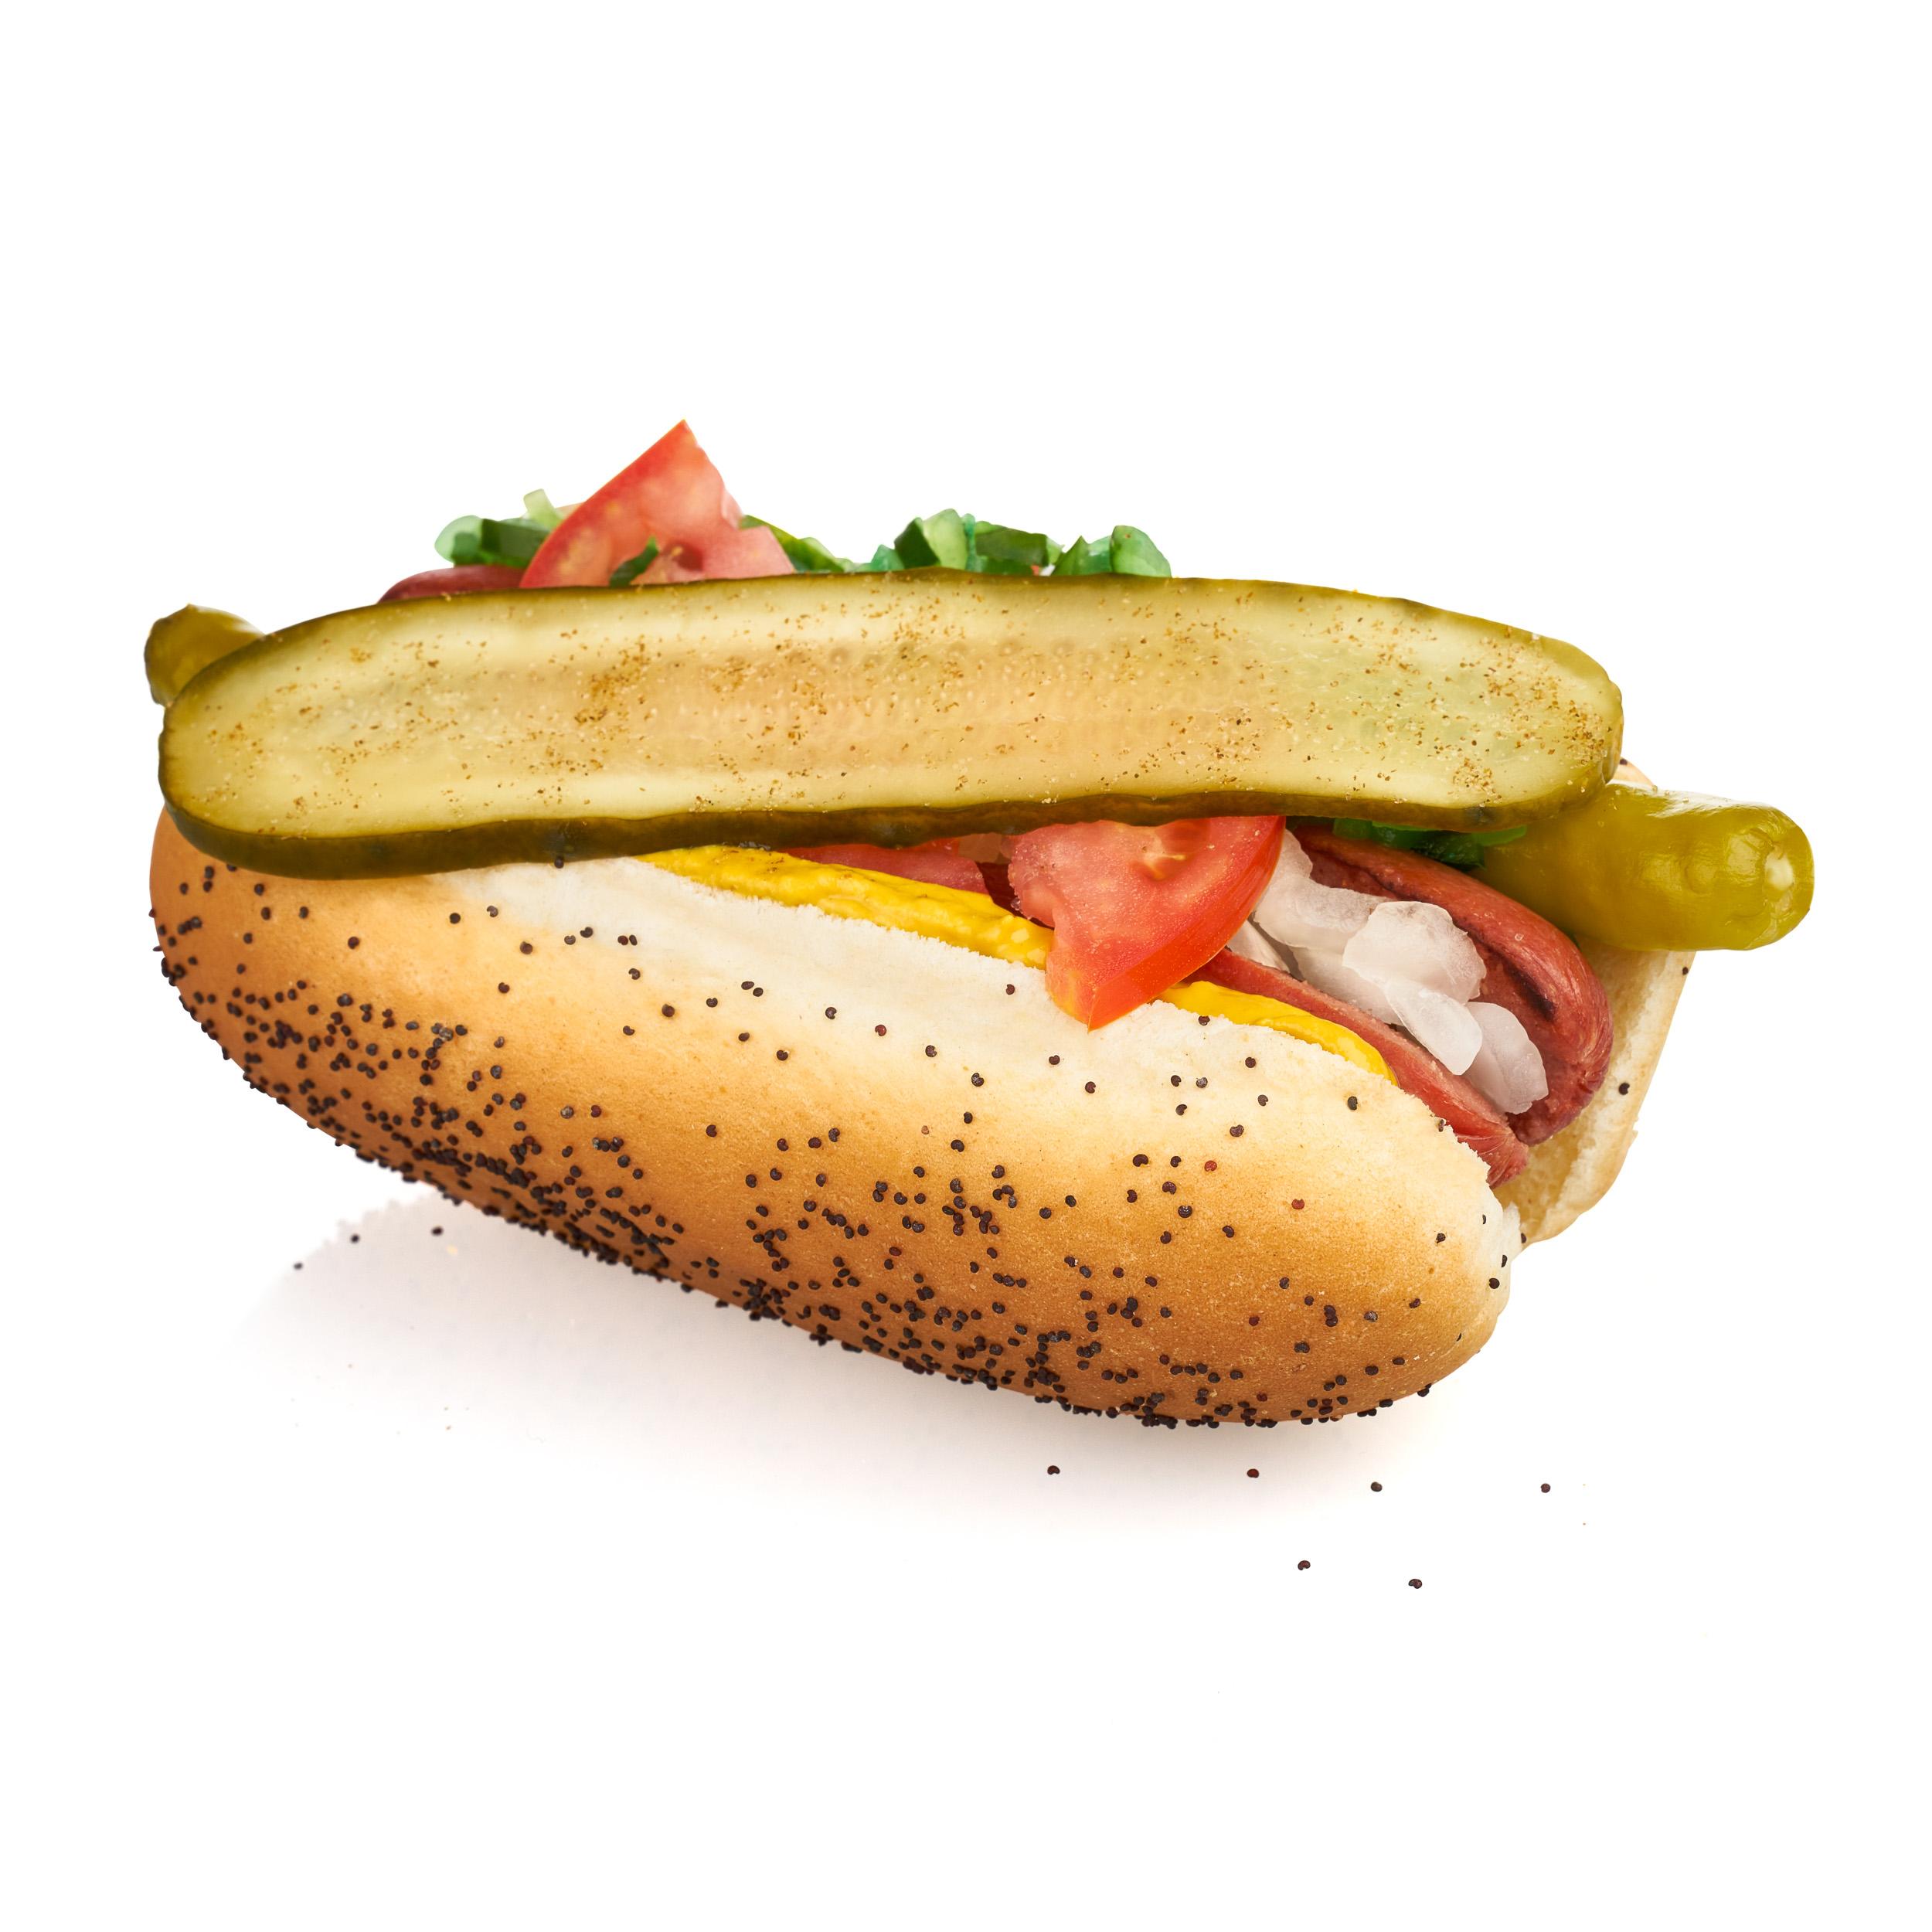 Miami_Fort_Lauderdale_food_photographer__BurgerFi_ChicagoStyle_hotdog_Franklin_Castillo-Edit.jpg